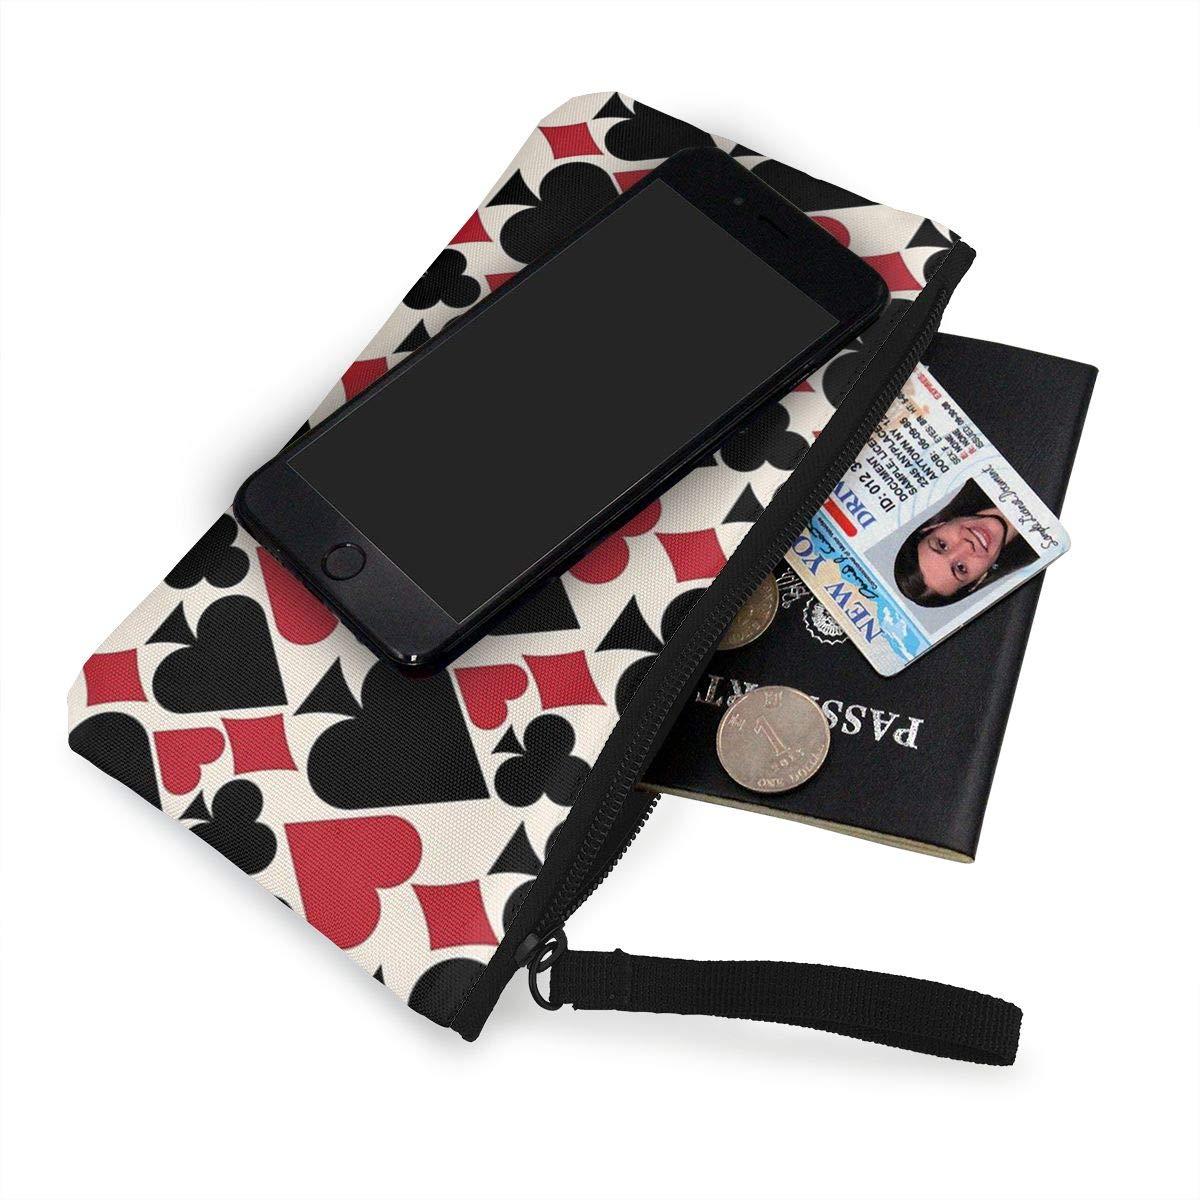 Canvas Coin Purse Poker Change Cash Bag Zipper Small Purse Wallets